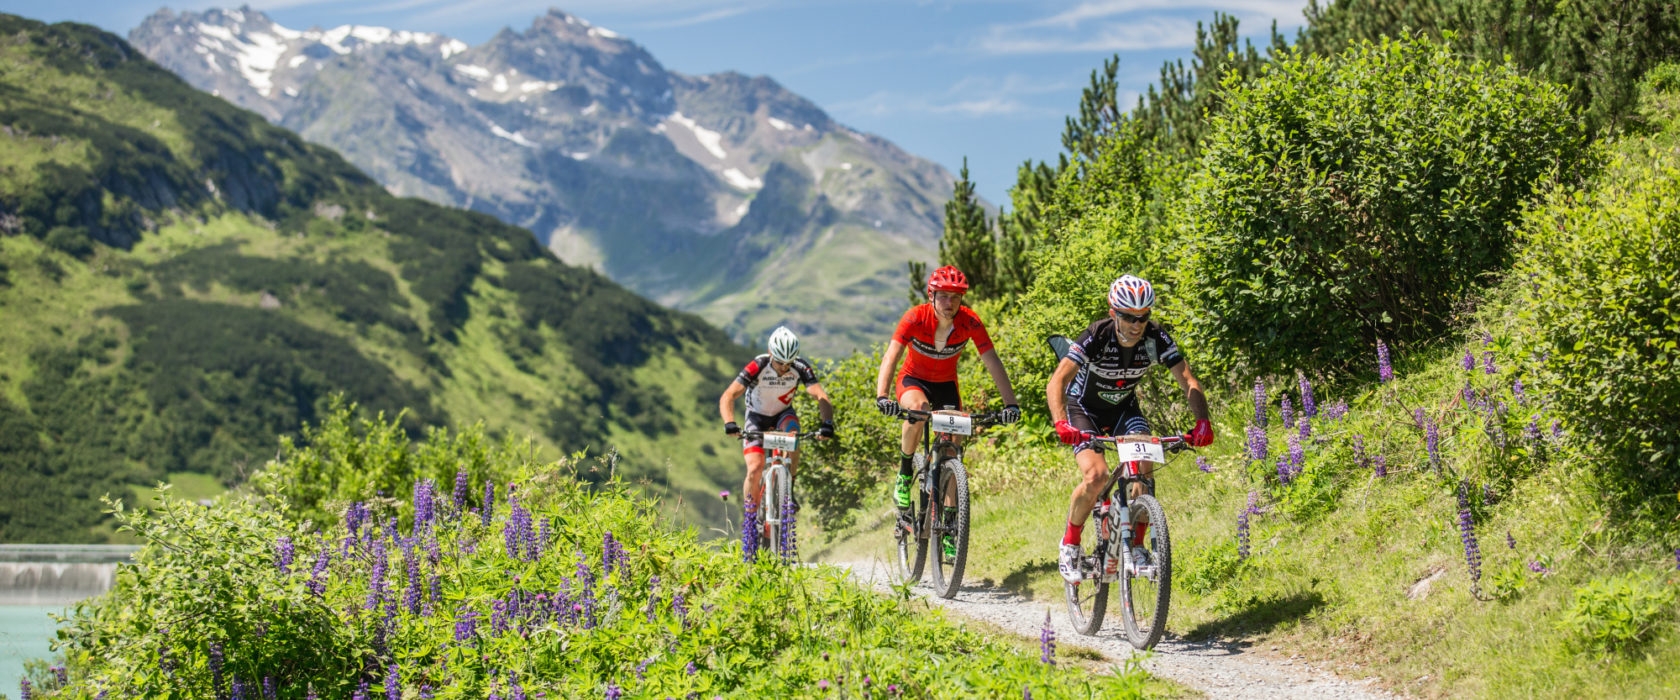 montafon mountainbike marathon